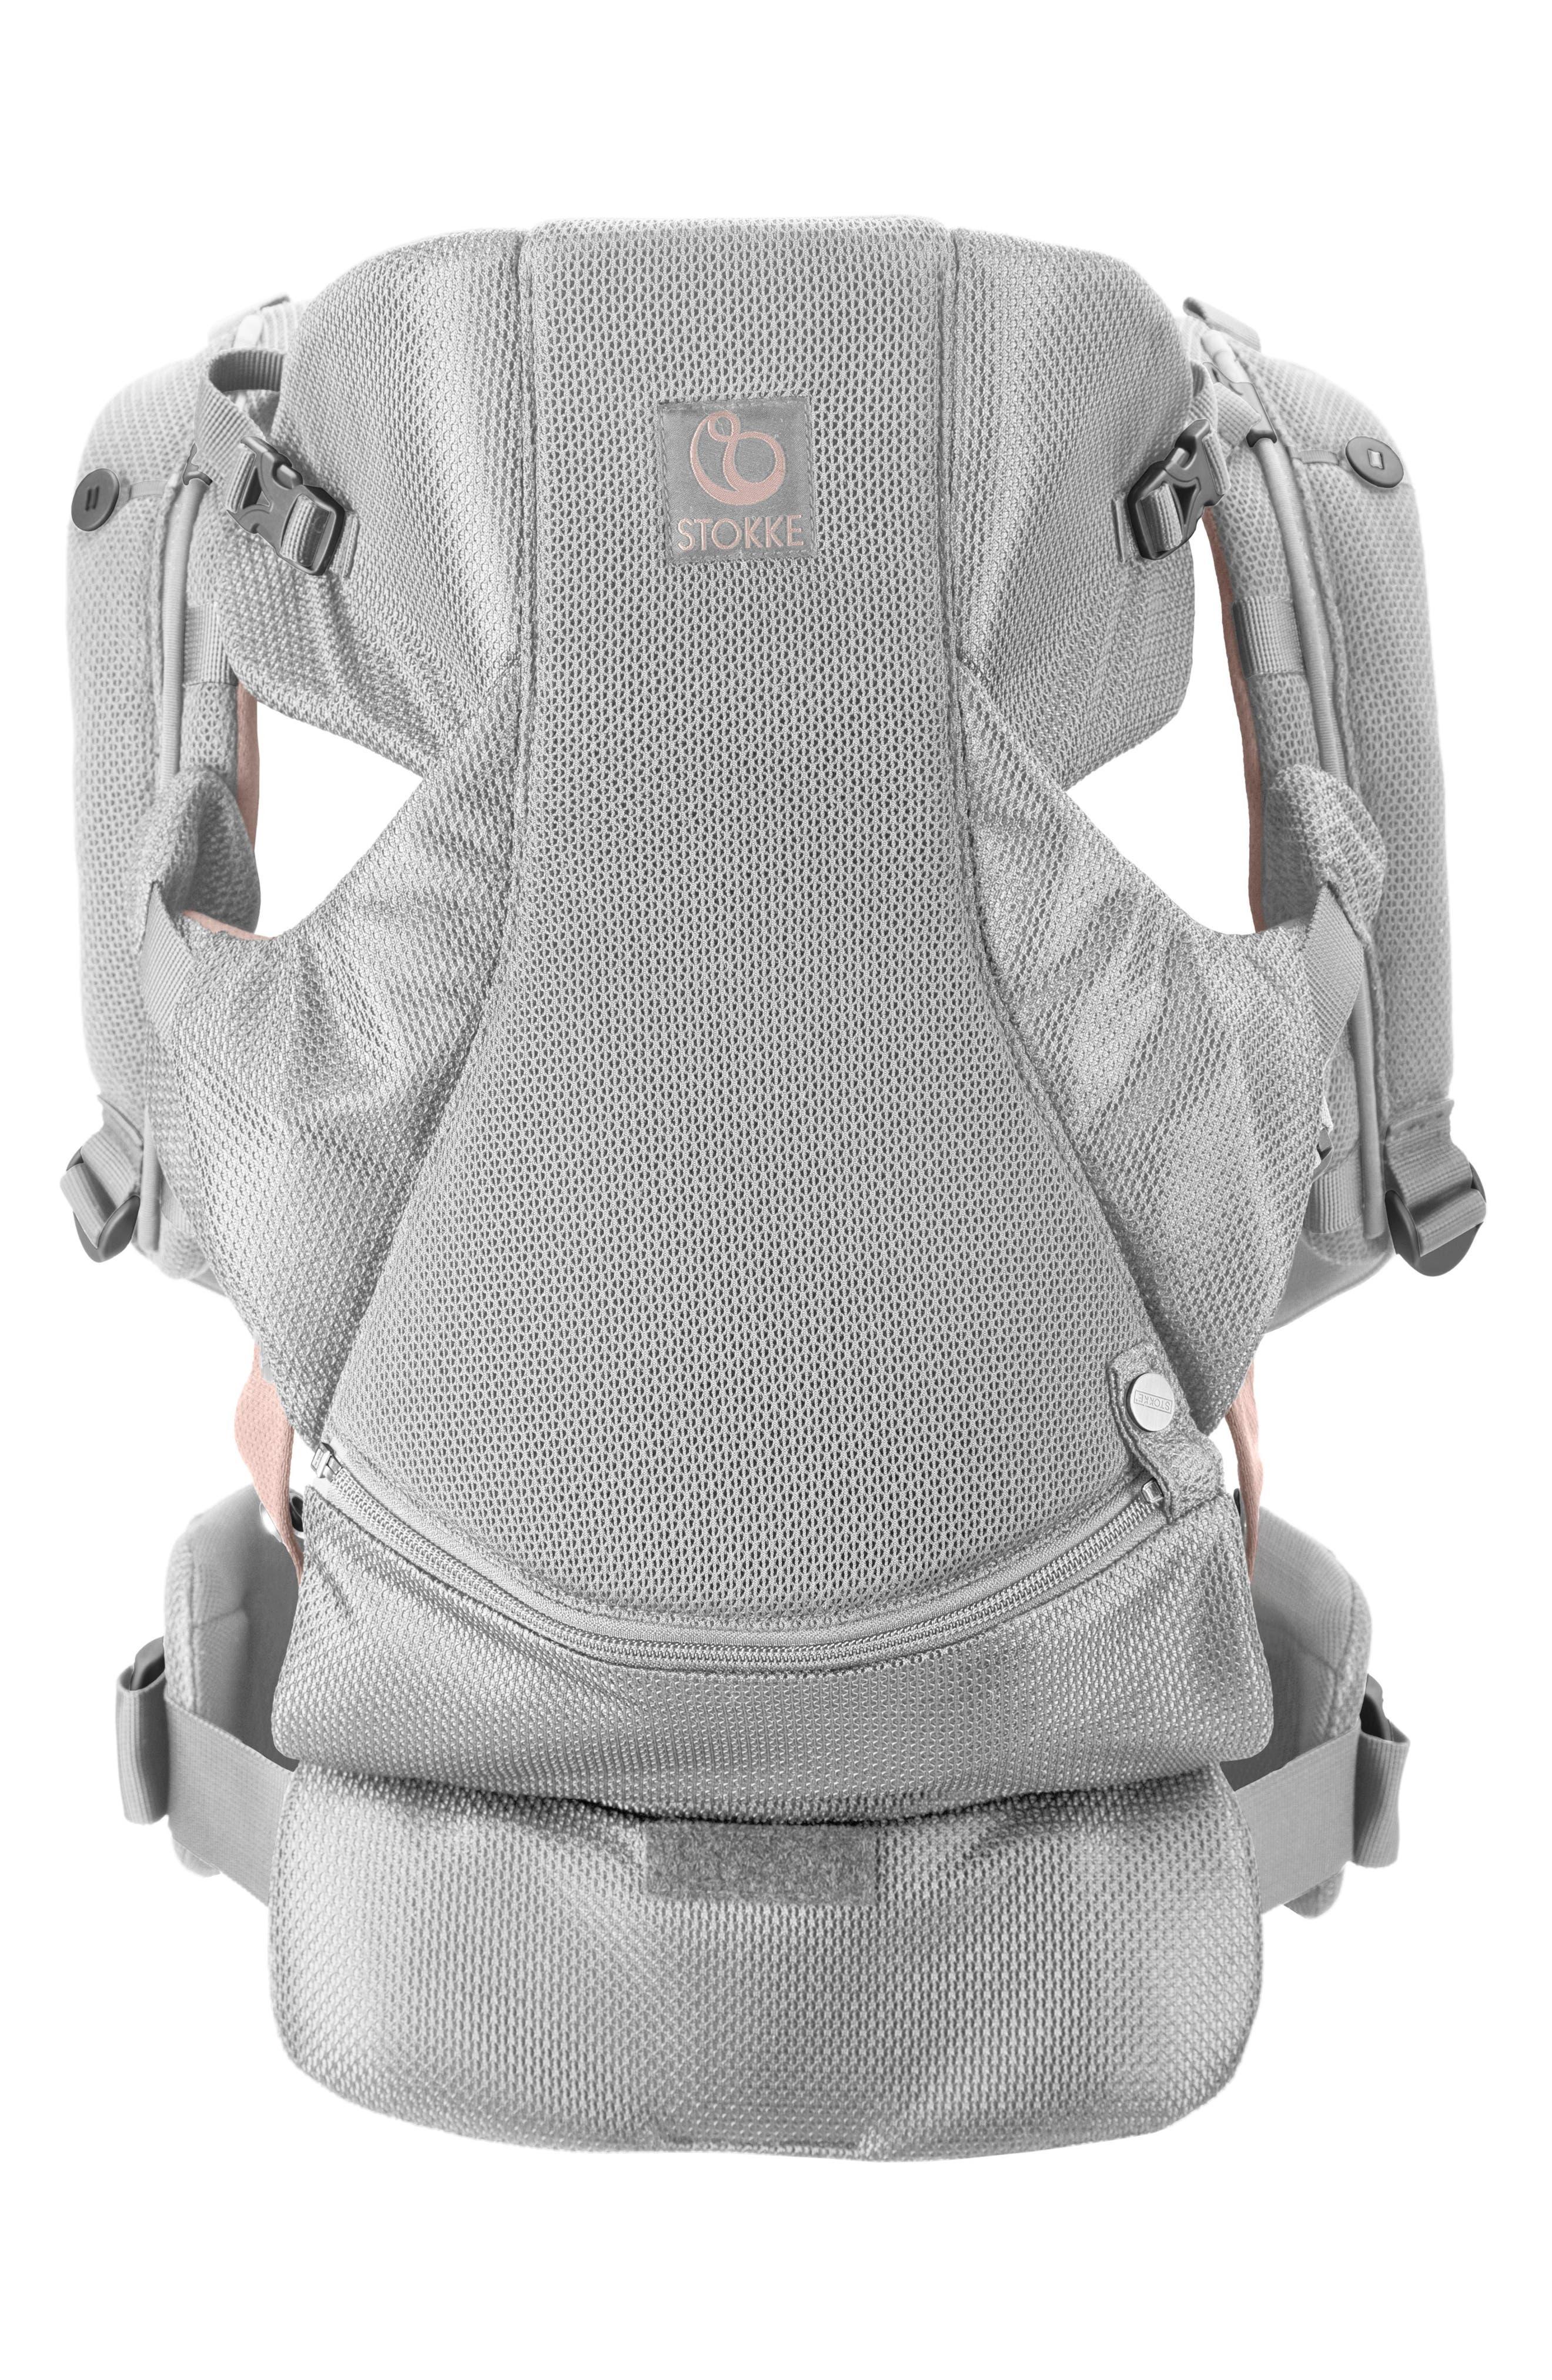 STOKKE, MyCarrier Front/Back Baby Carrier, Alternate thumbnail 2, color, PINK MESH